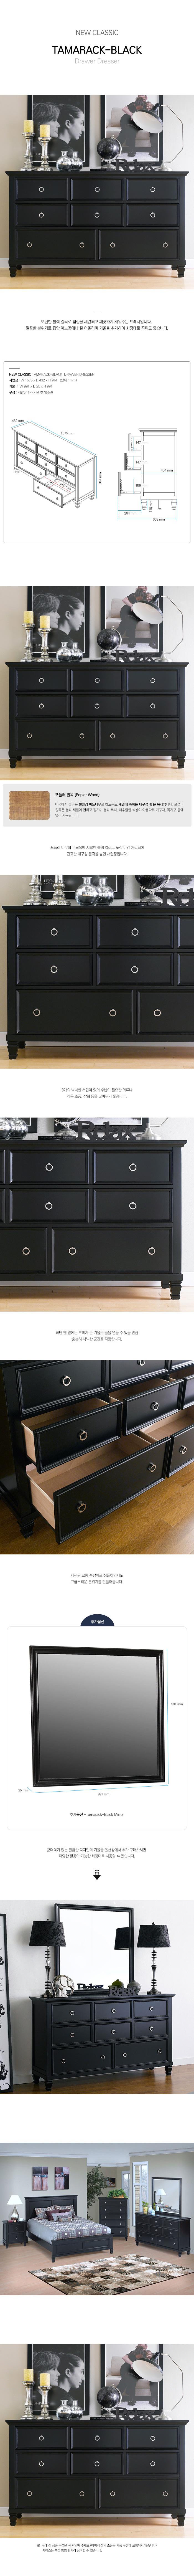 tamarack_black_Drawer-Dresser_180511.jpg